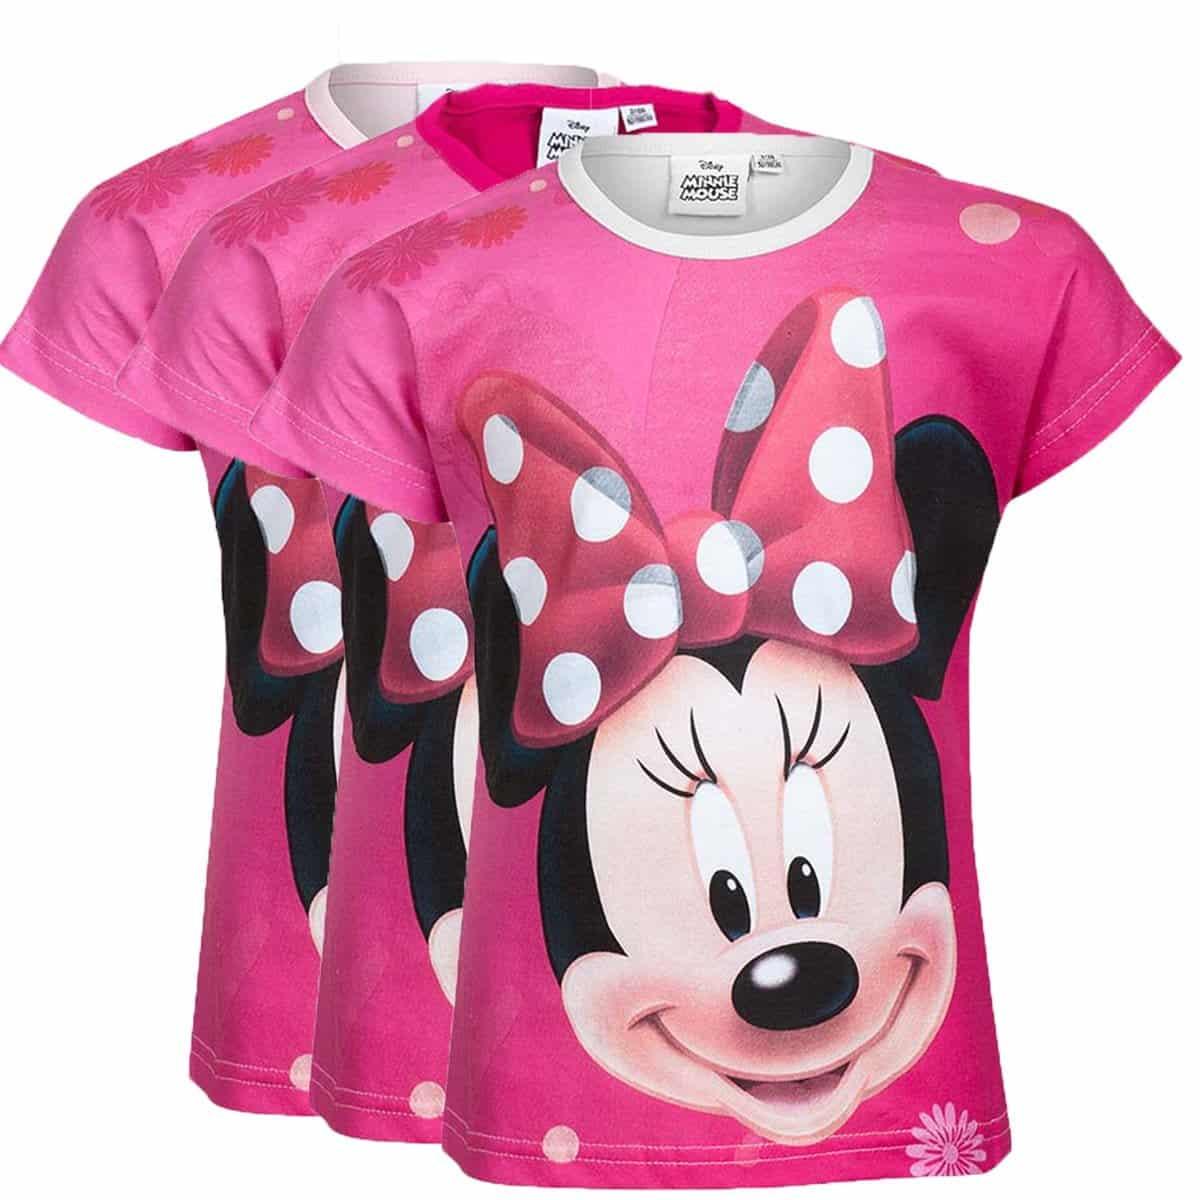 c721038f Rosa t-skjorte | t-skjorte til barn med Minni Mus motiv | RiffRaff.no